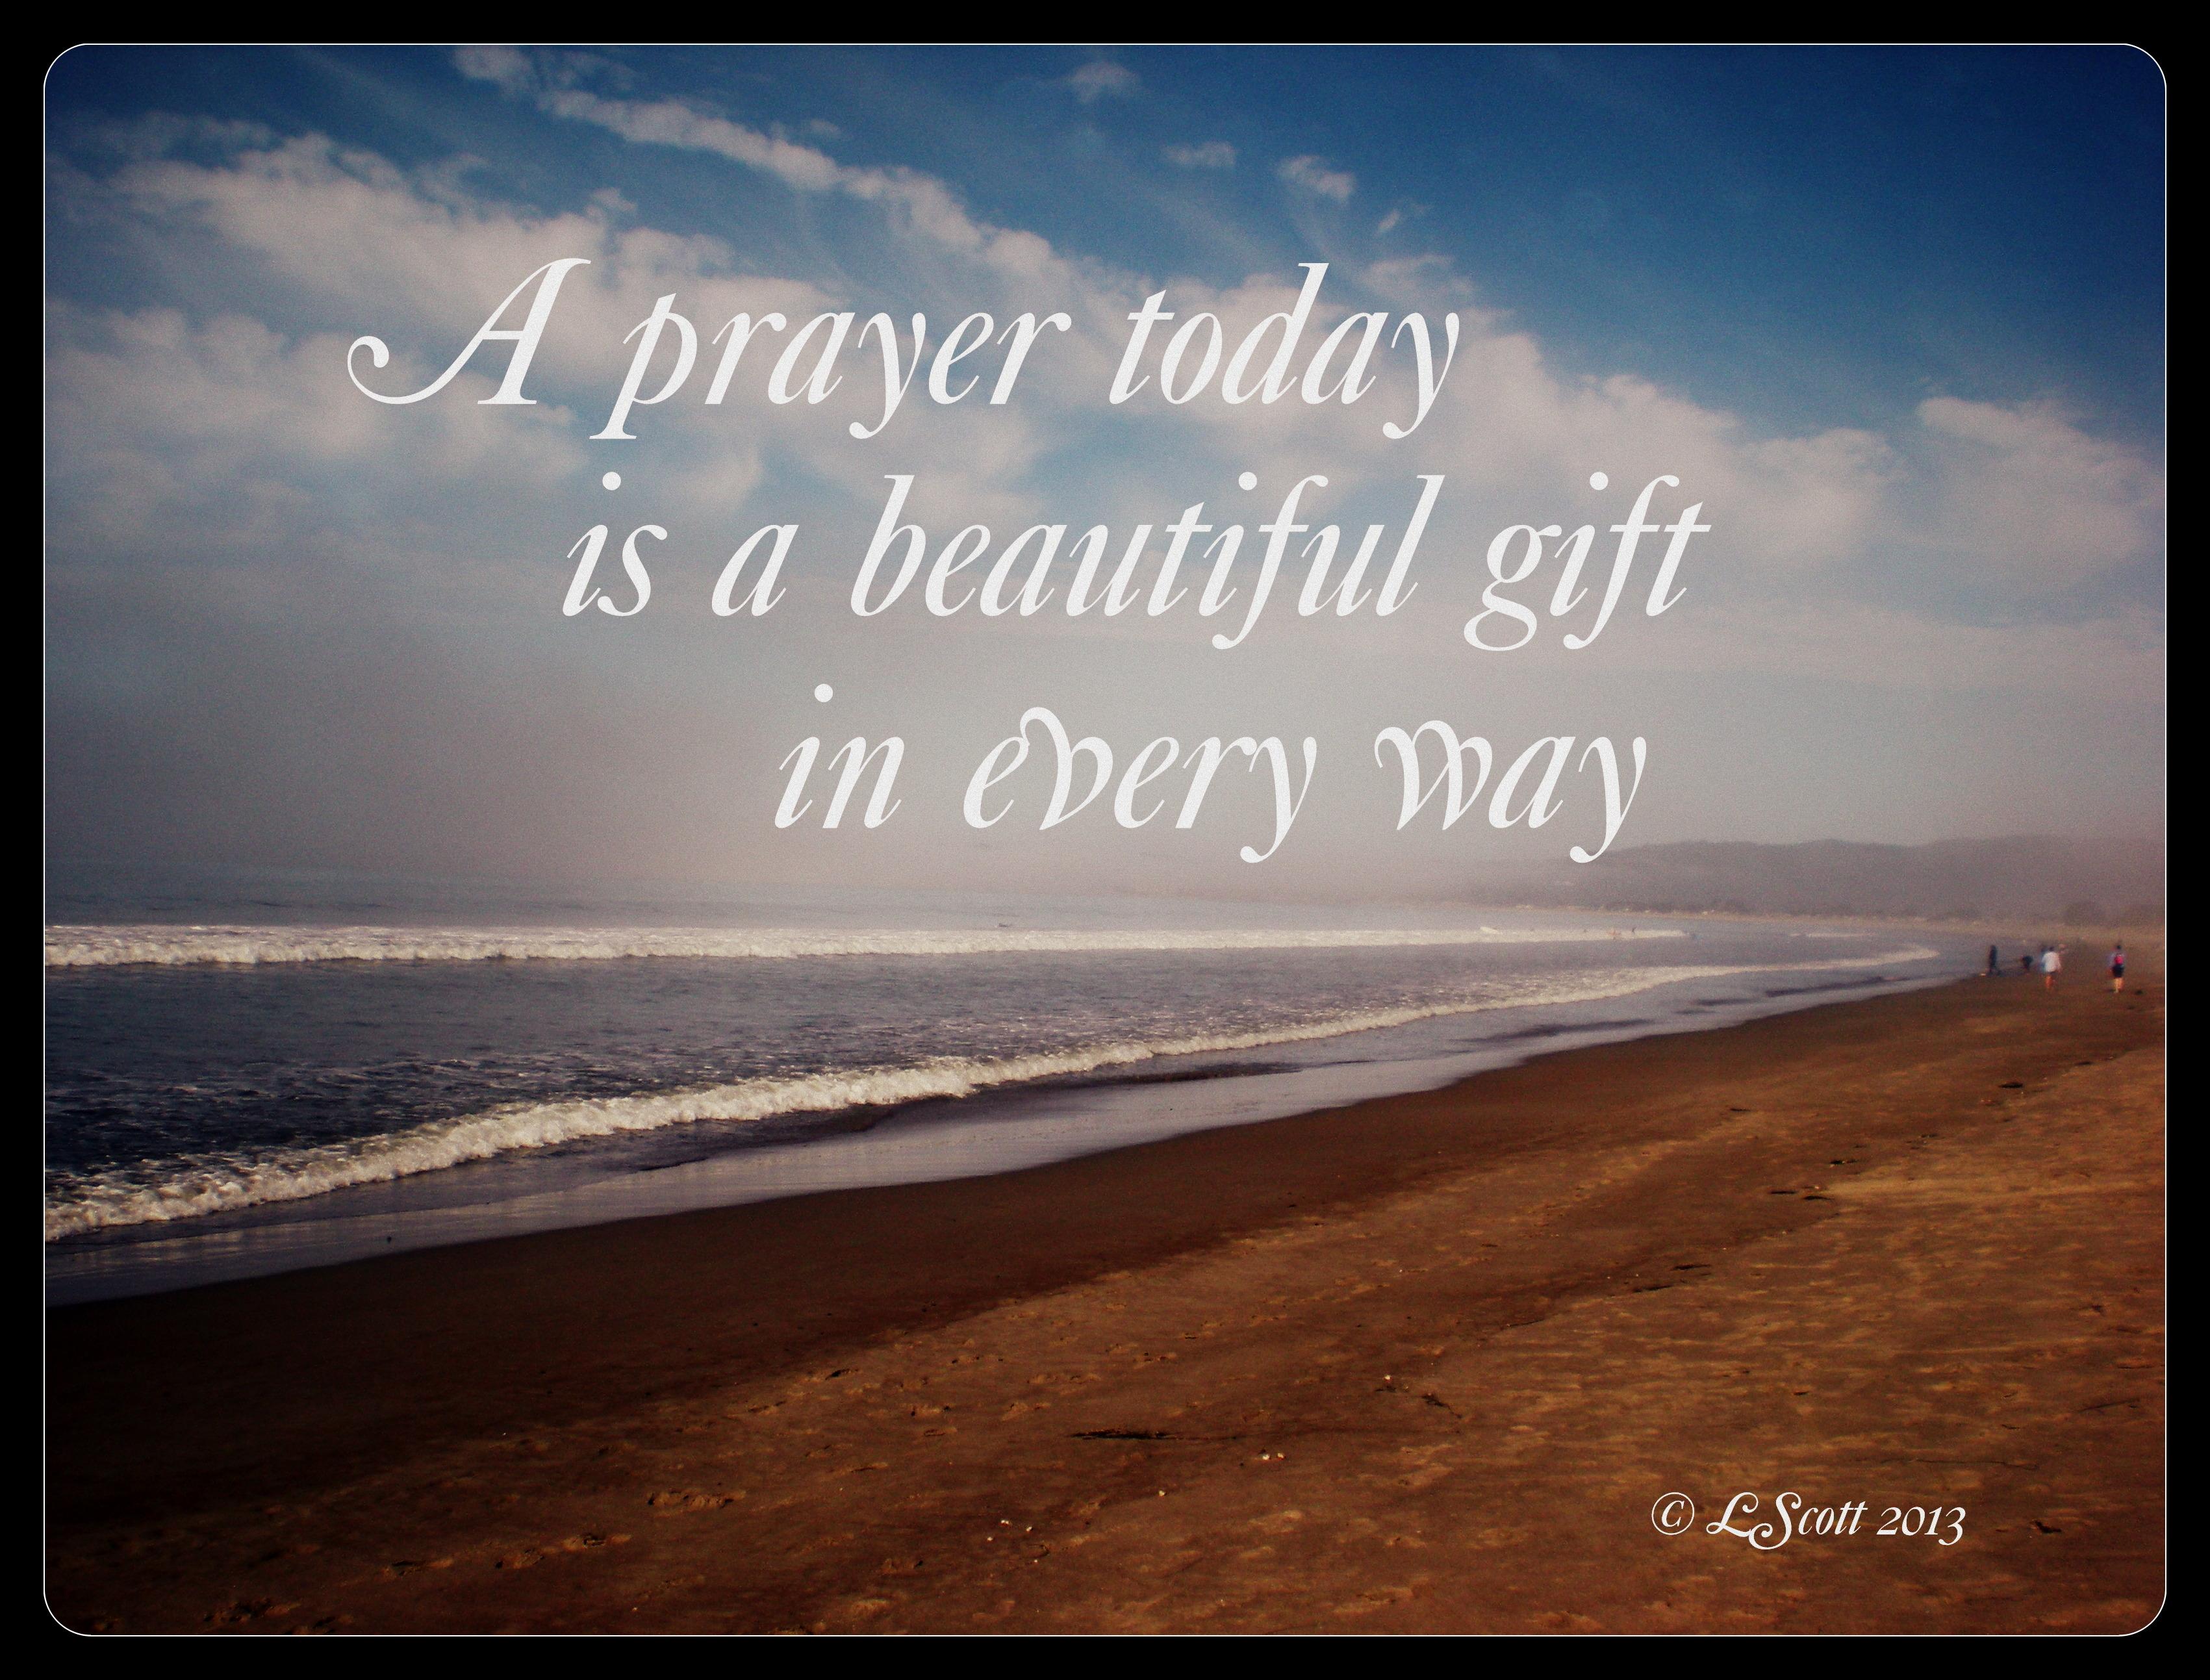 Prayer card 2